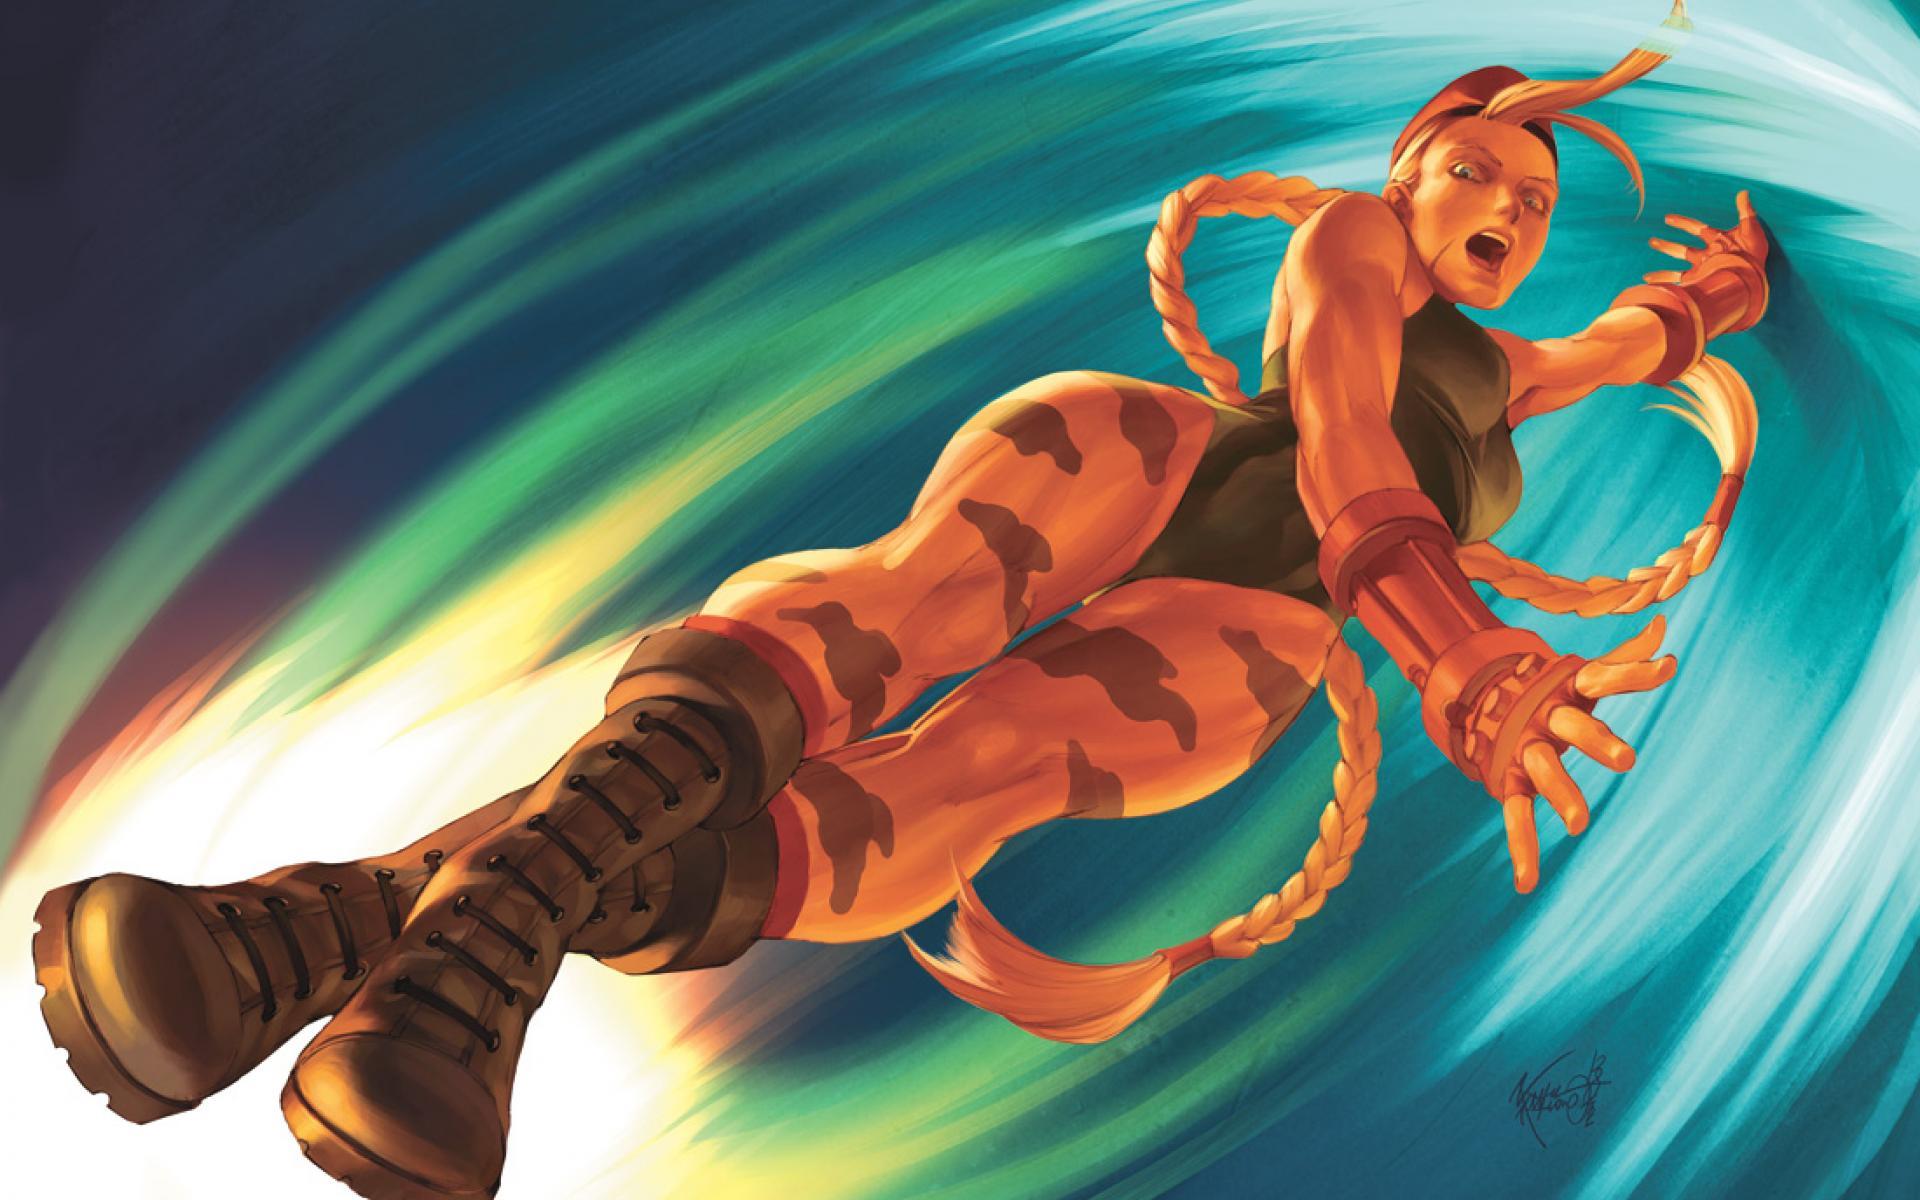 Street Fighter Cammy Wallpaper | Customity